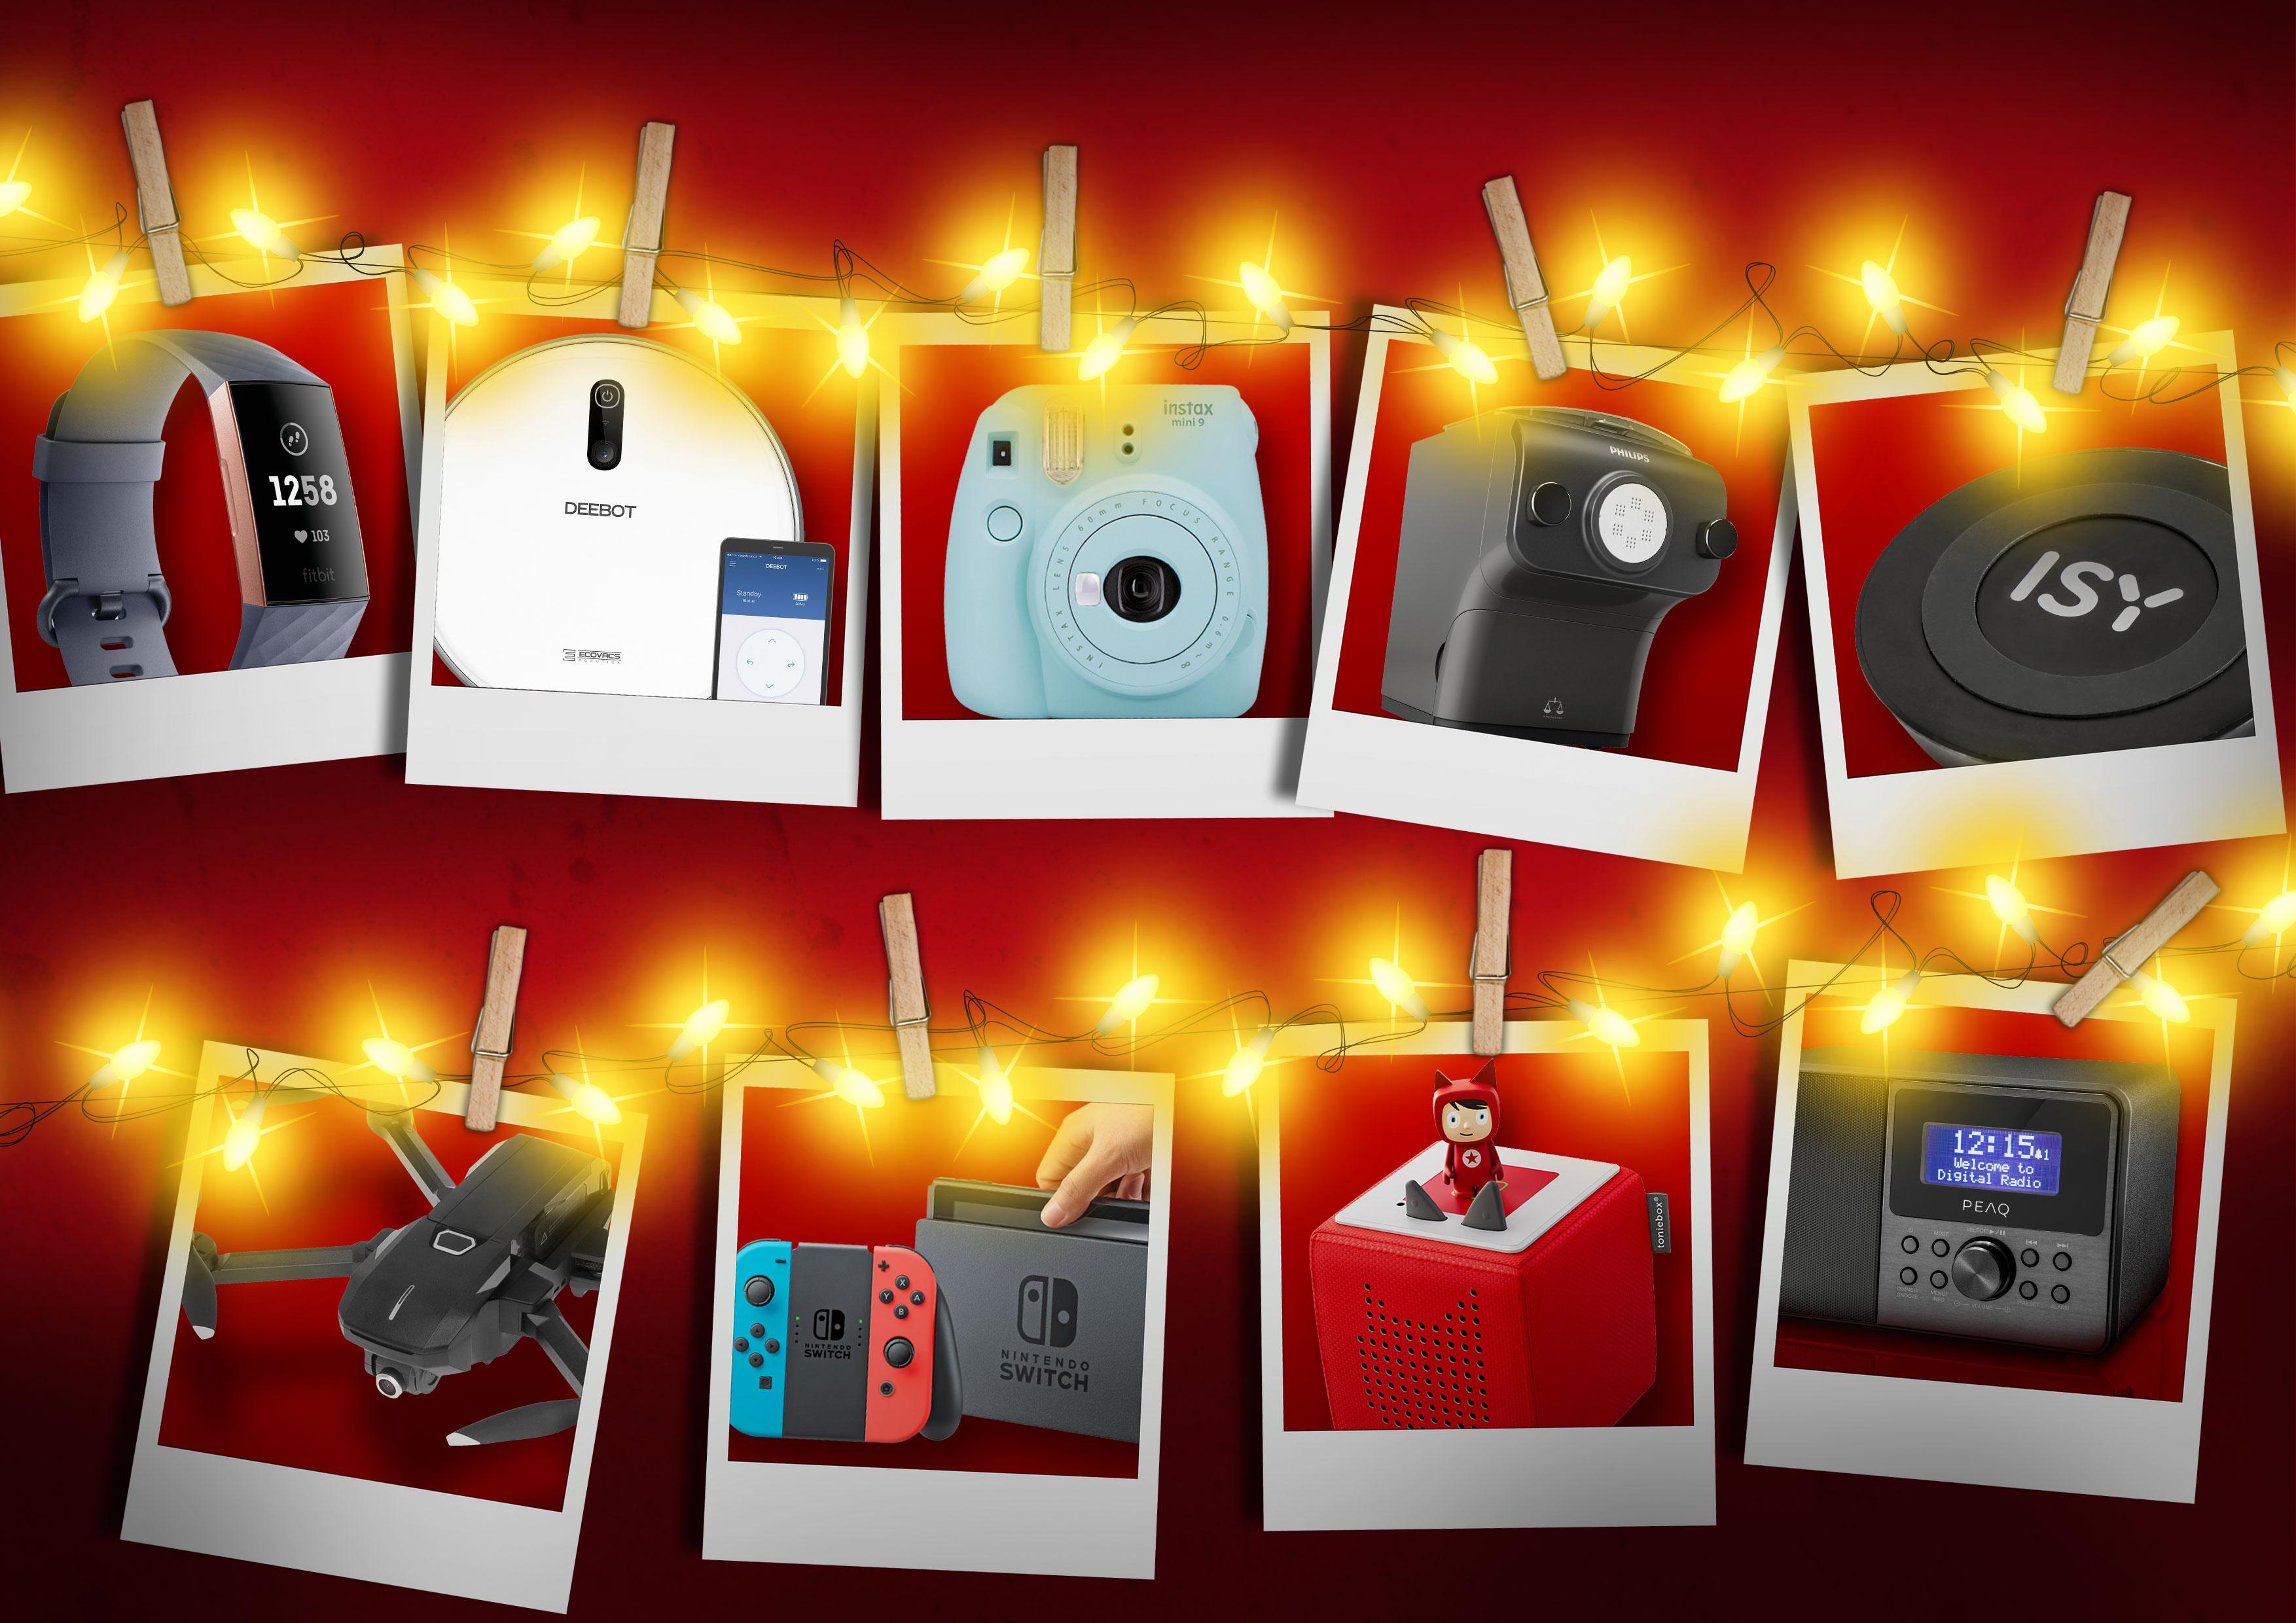 No more Christmas shopping stress MediaMarkt's gift ideas for ...